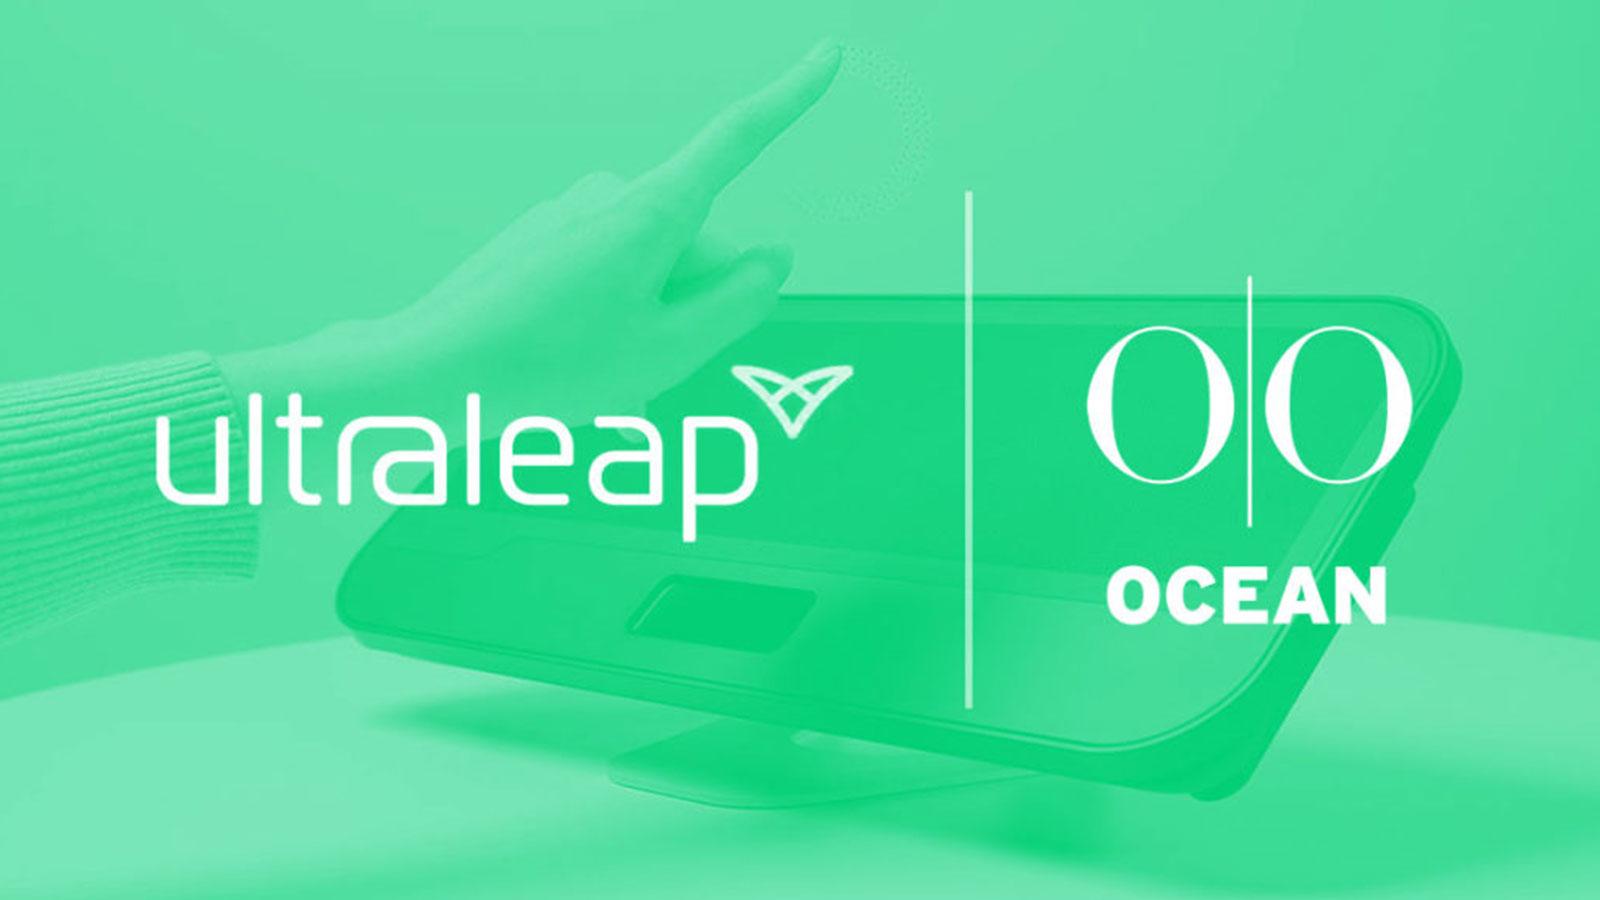 Ocean Outdoor and Ultraleap logos